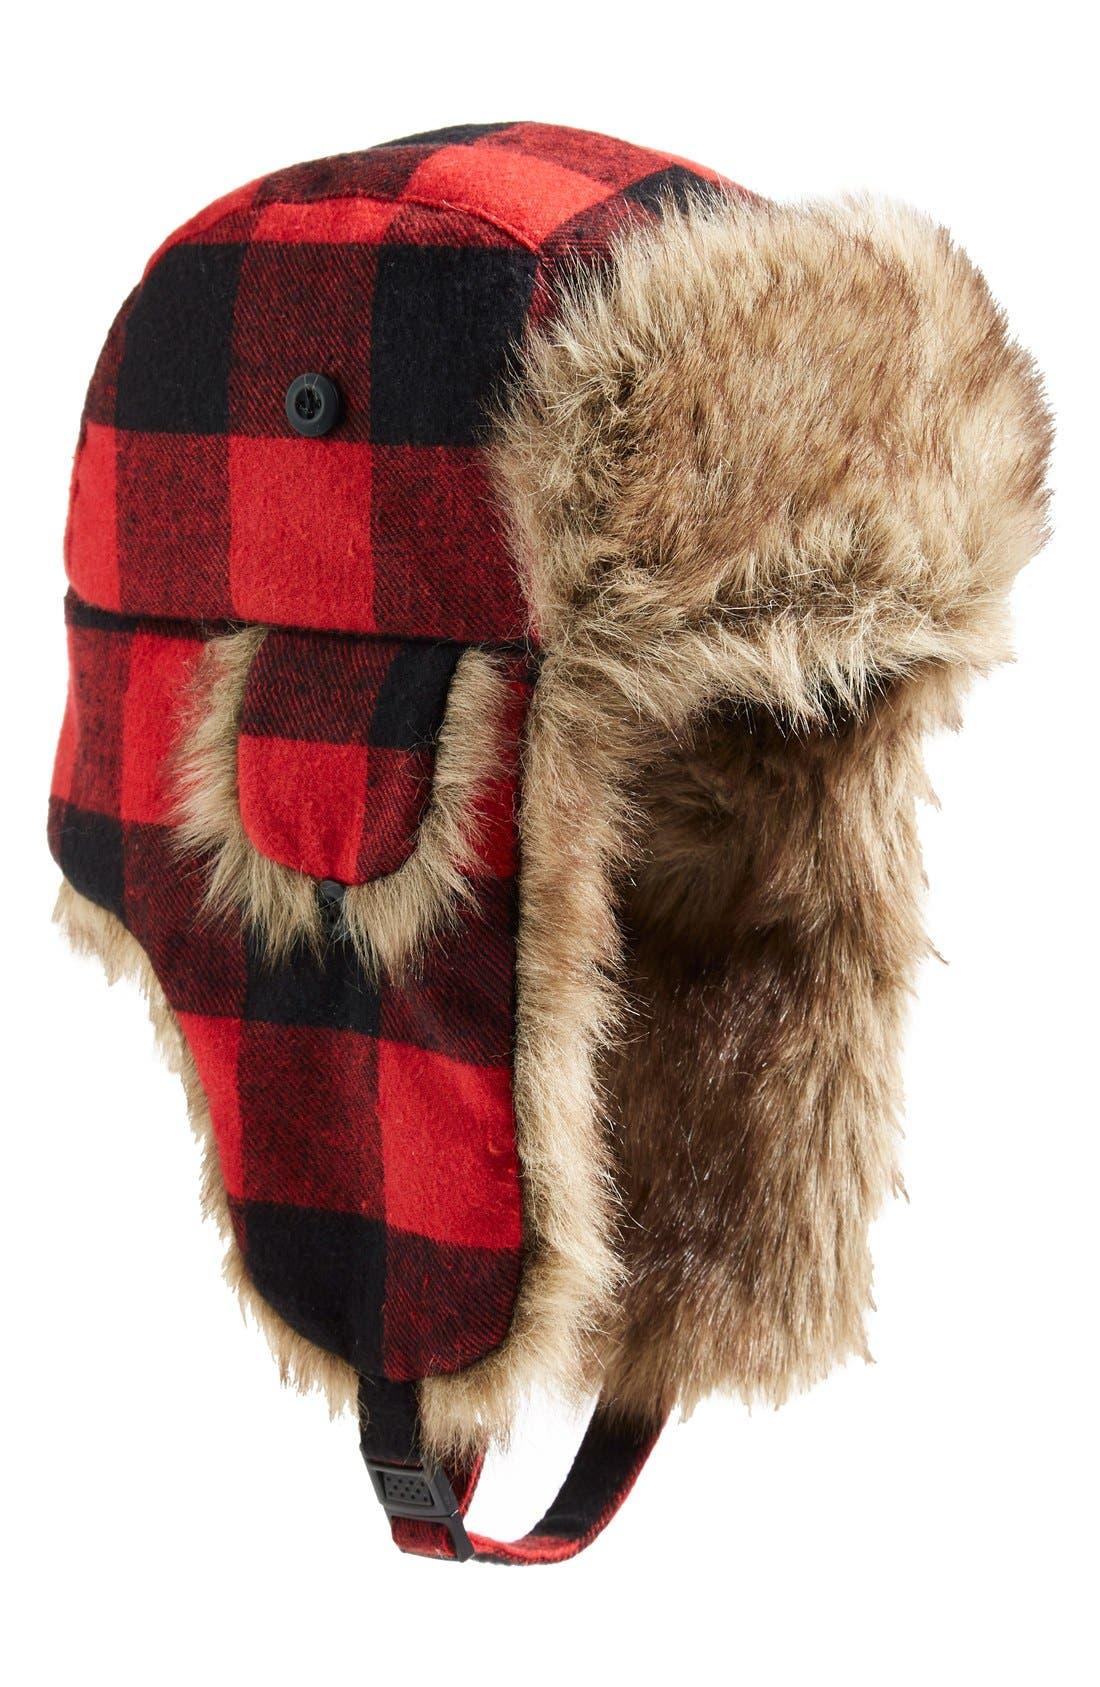 Alternate Image 1 Selected - PJ Salvage Plaid Trapper Hat with Faux Fur Trim